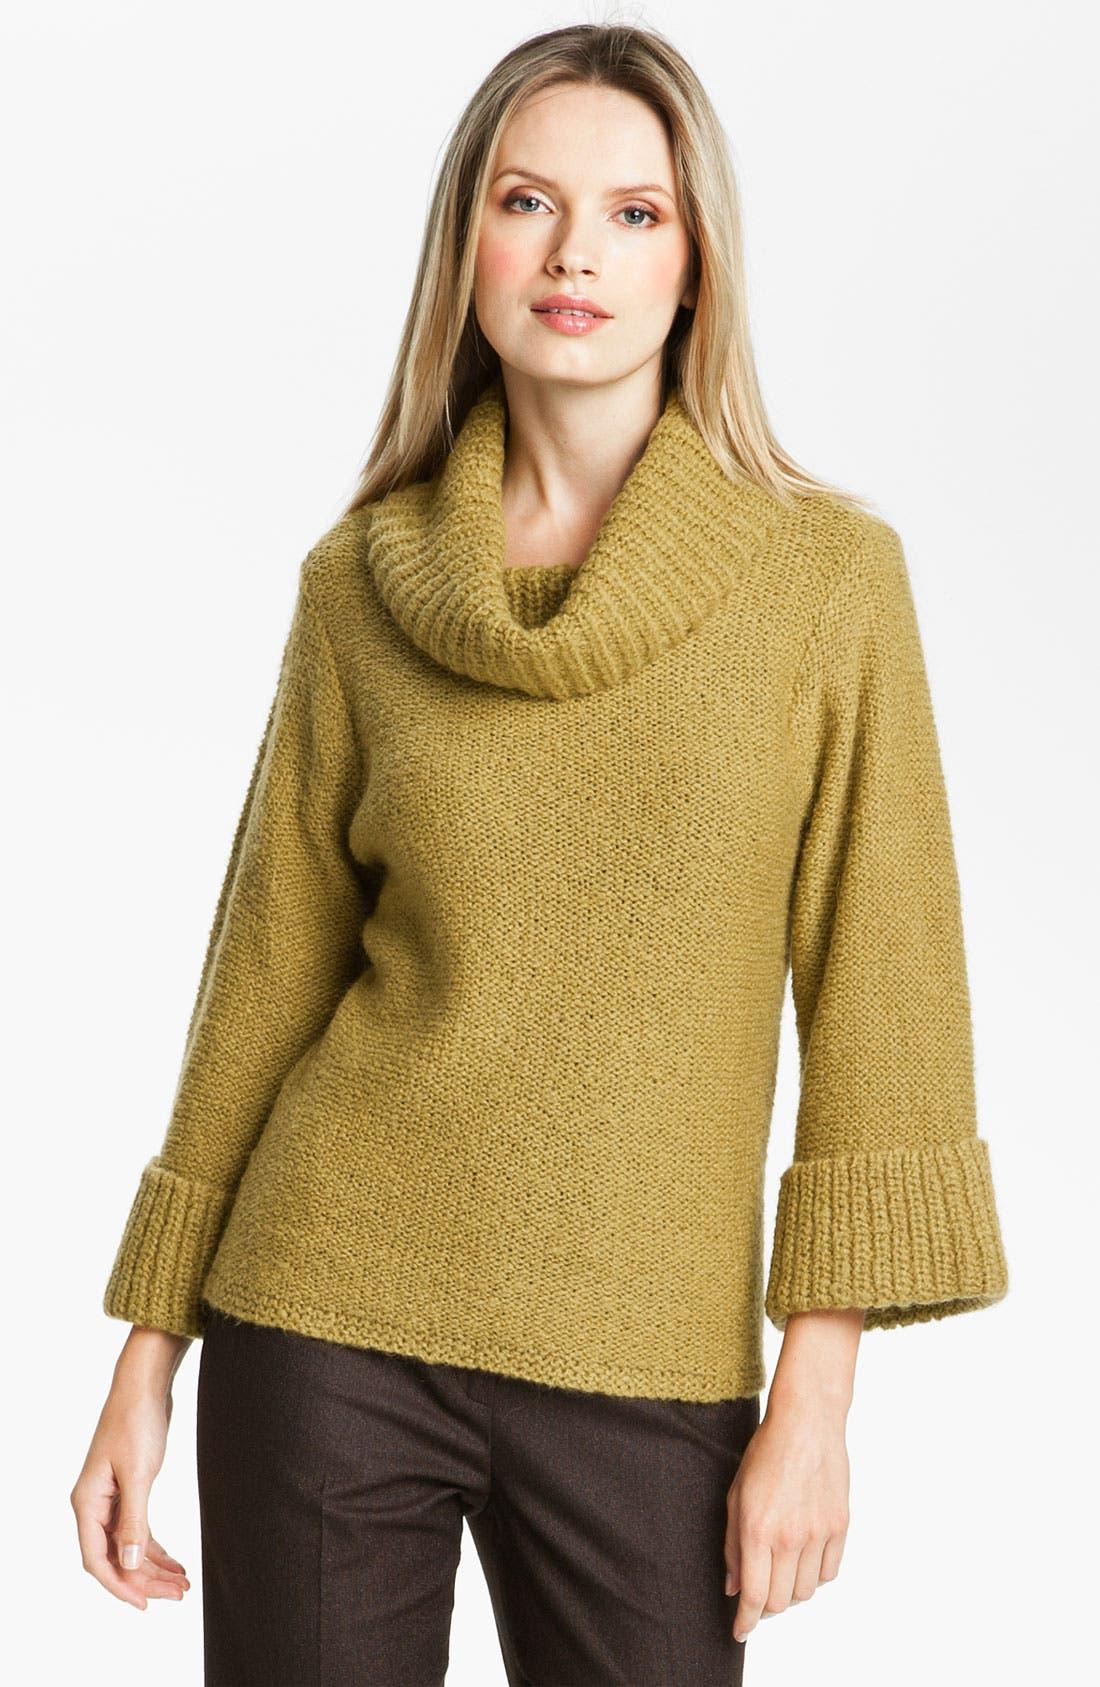 Alternate Image 1 Selected - Classiques Entier® 'Mousse' Cowl Neck Sweater